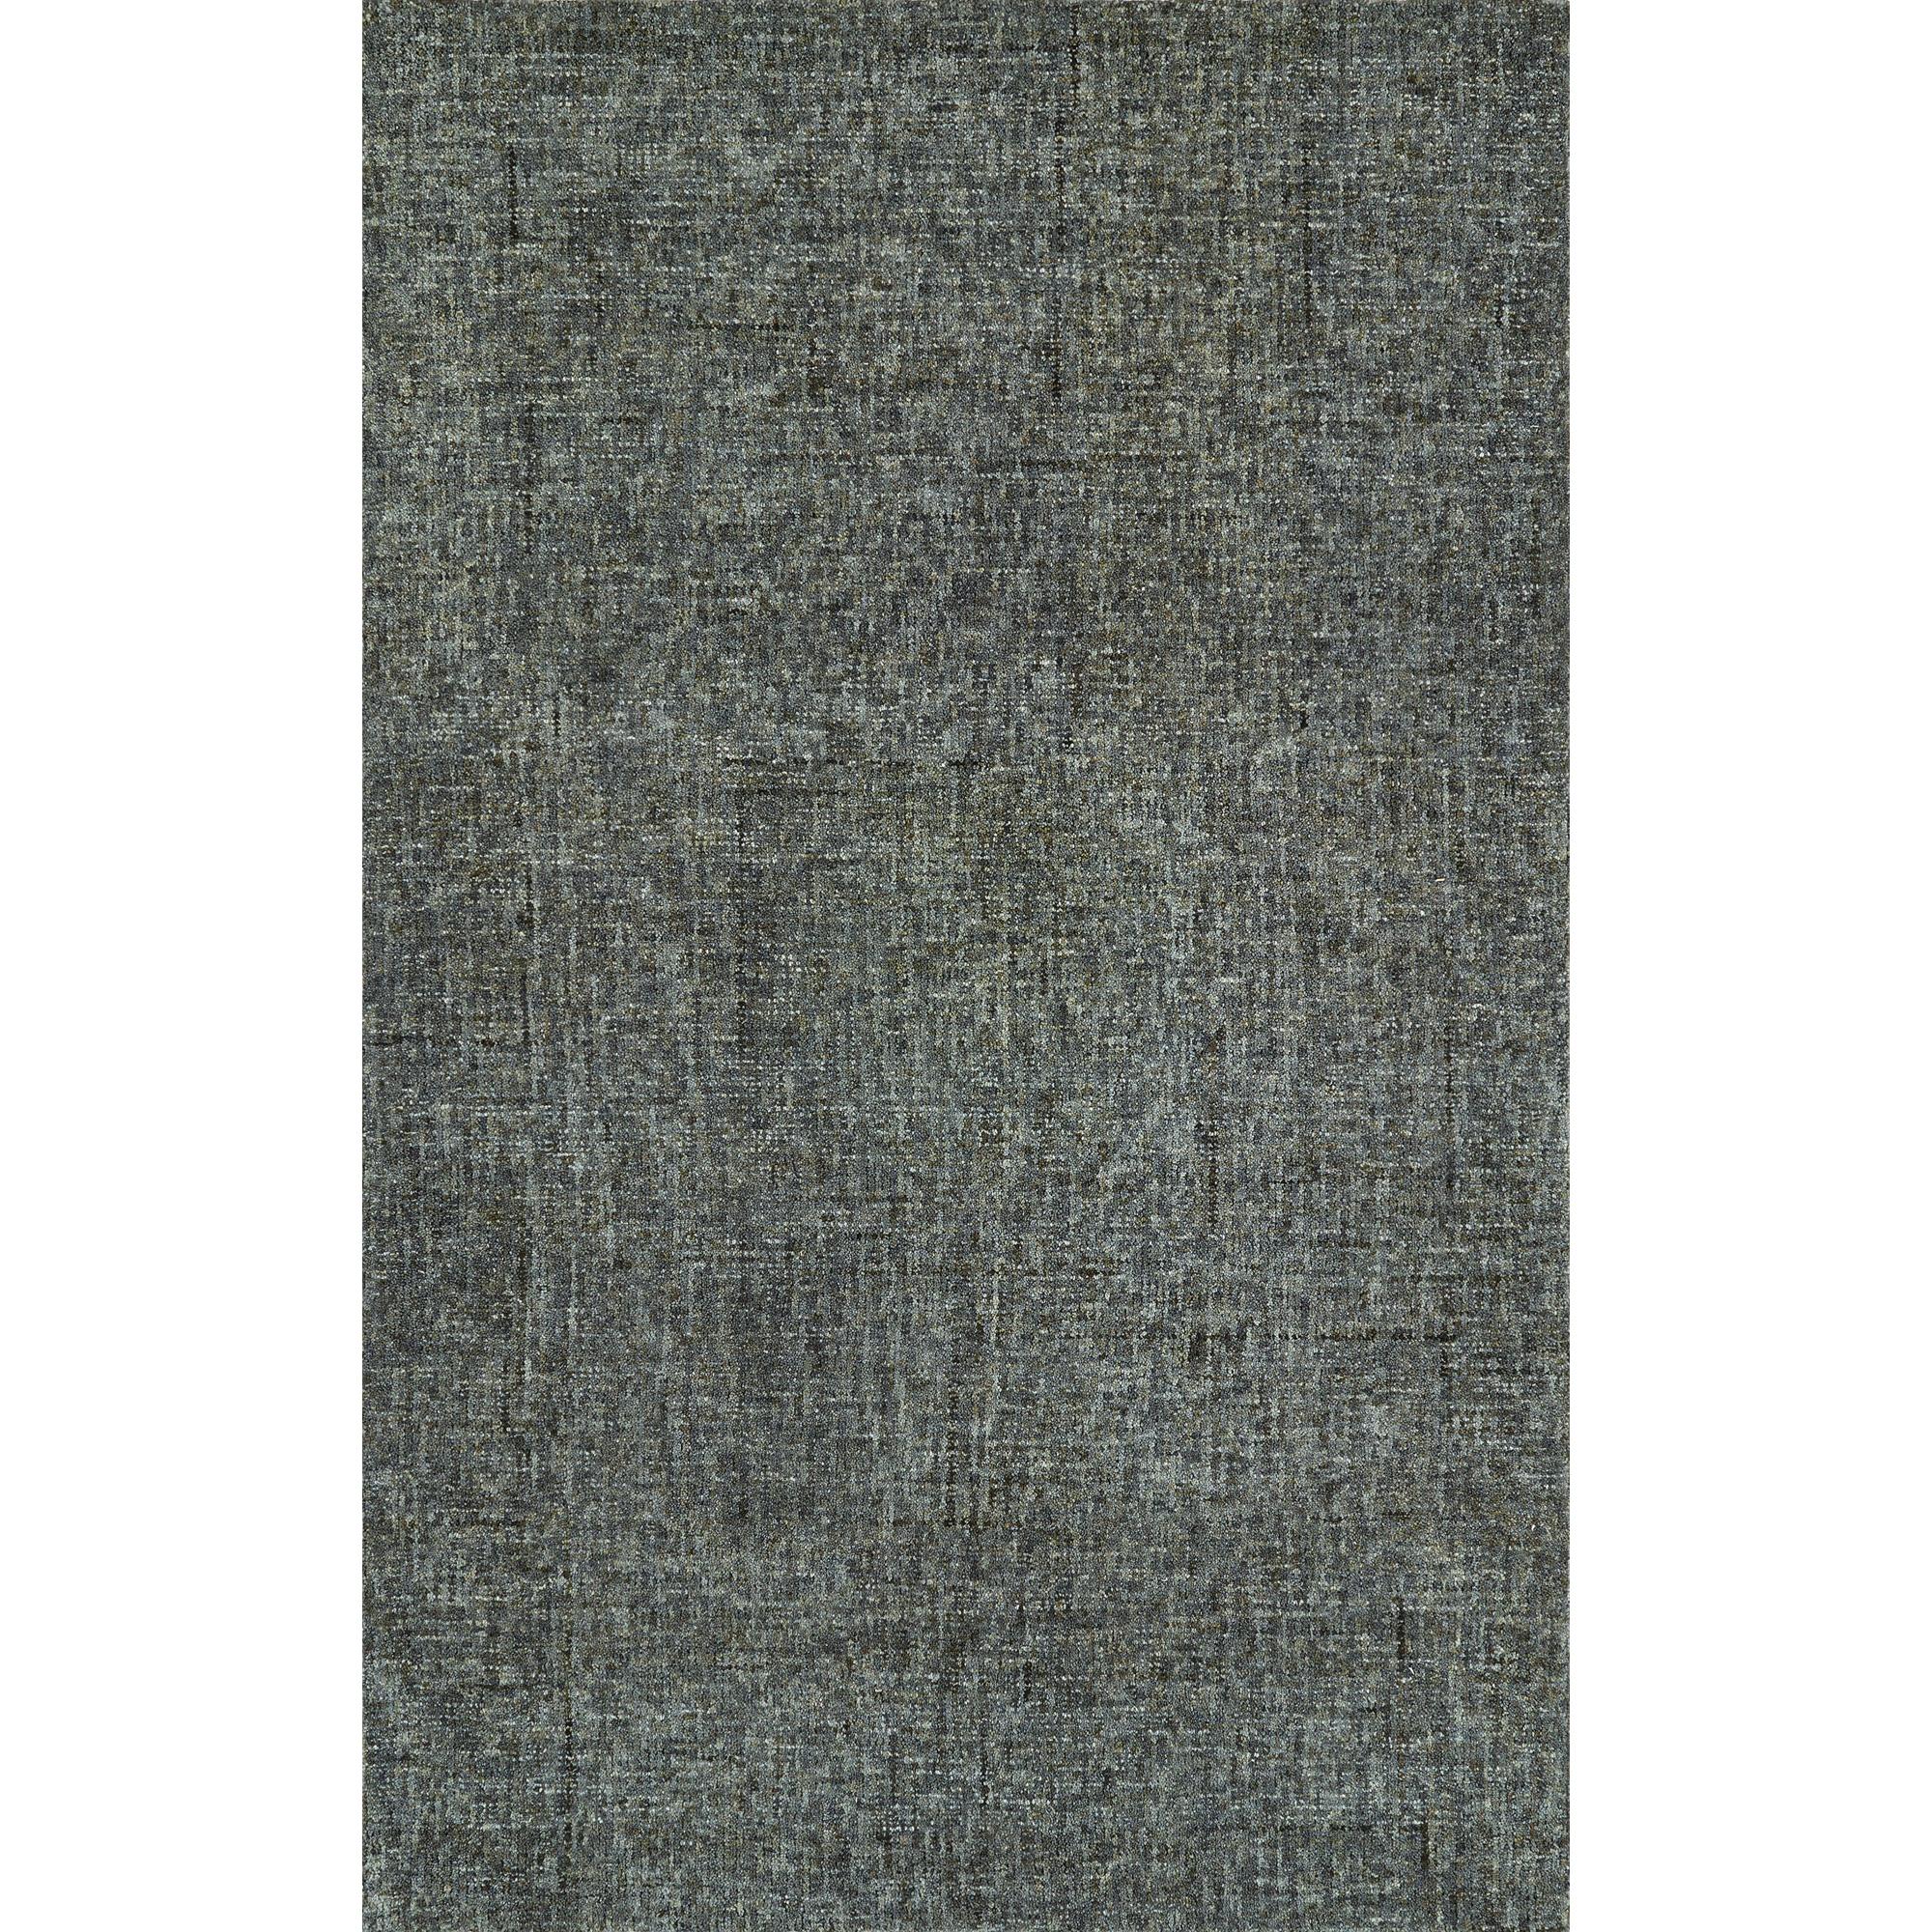 Dalyn Rug | Calisa Carbon 5x8 Area Rug